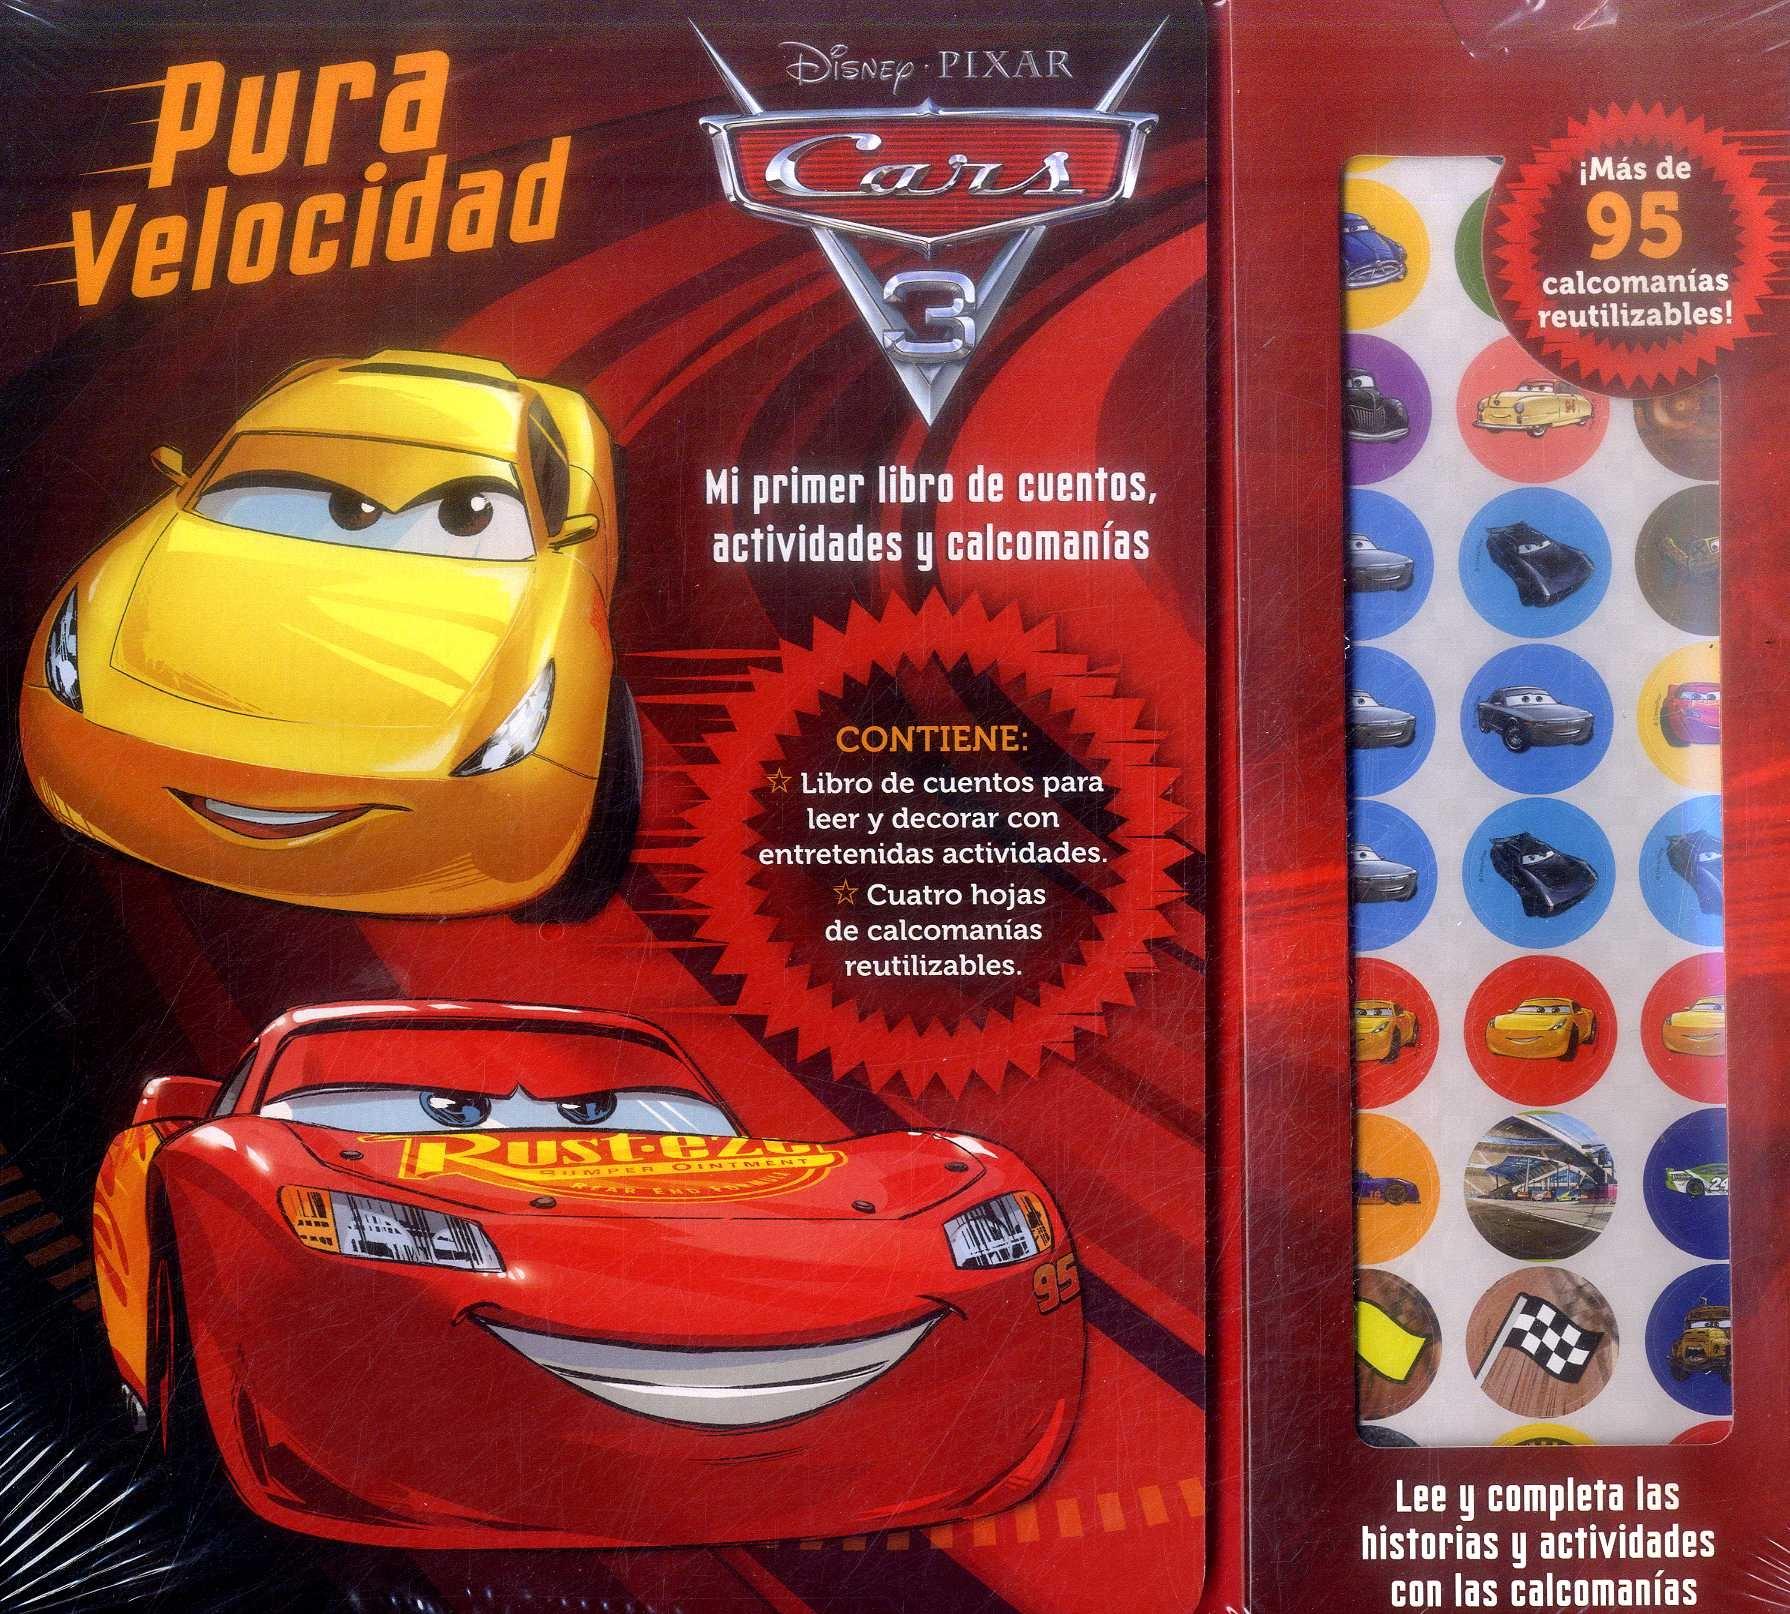 Cars 3 - Pura Velocidad - Disney - M4 Editora